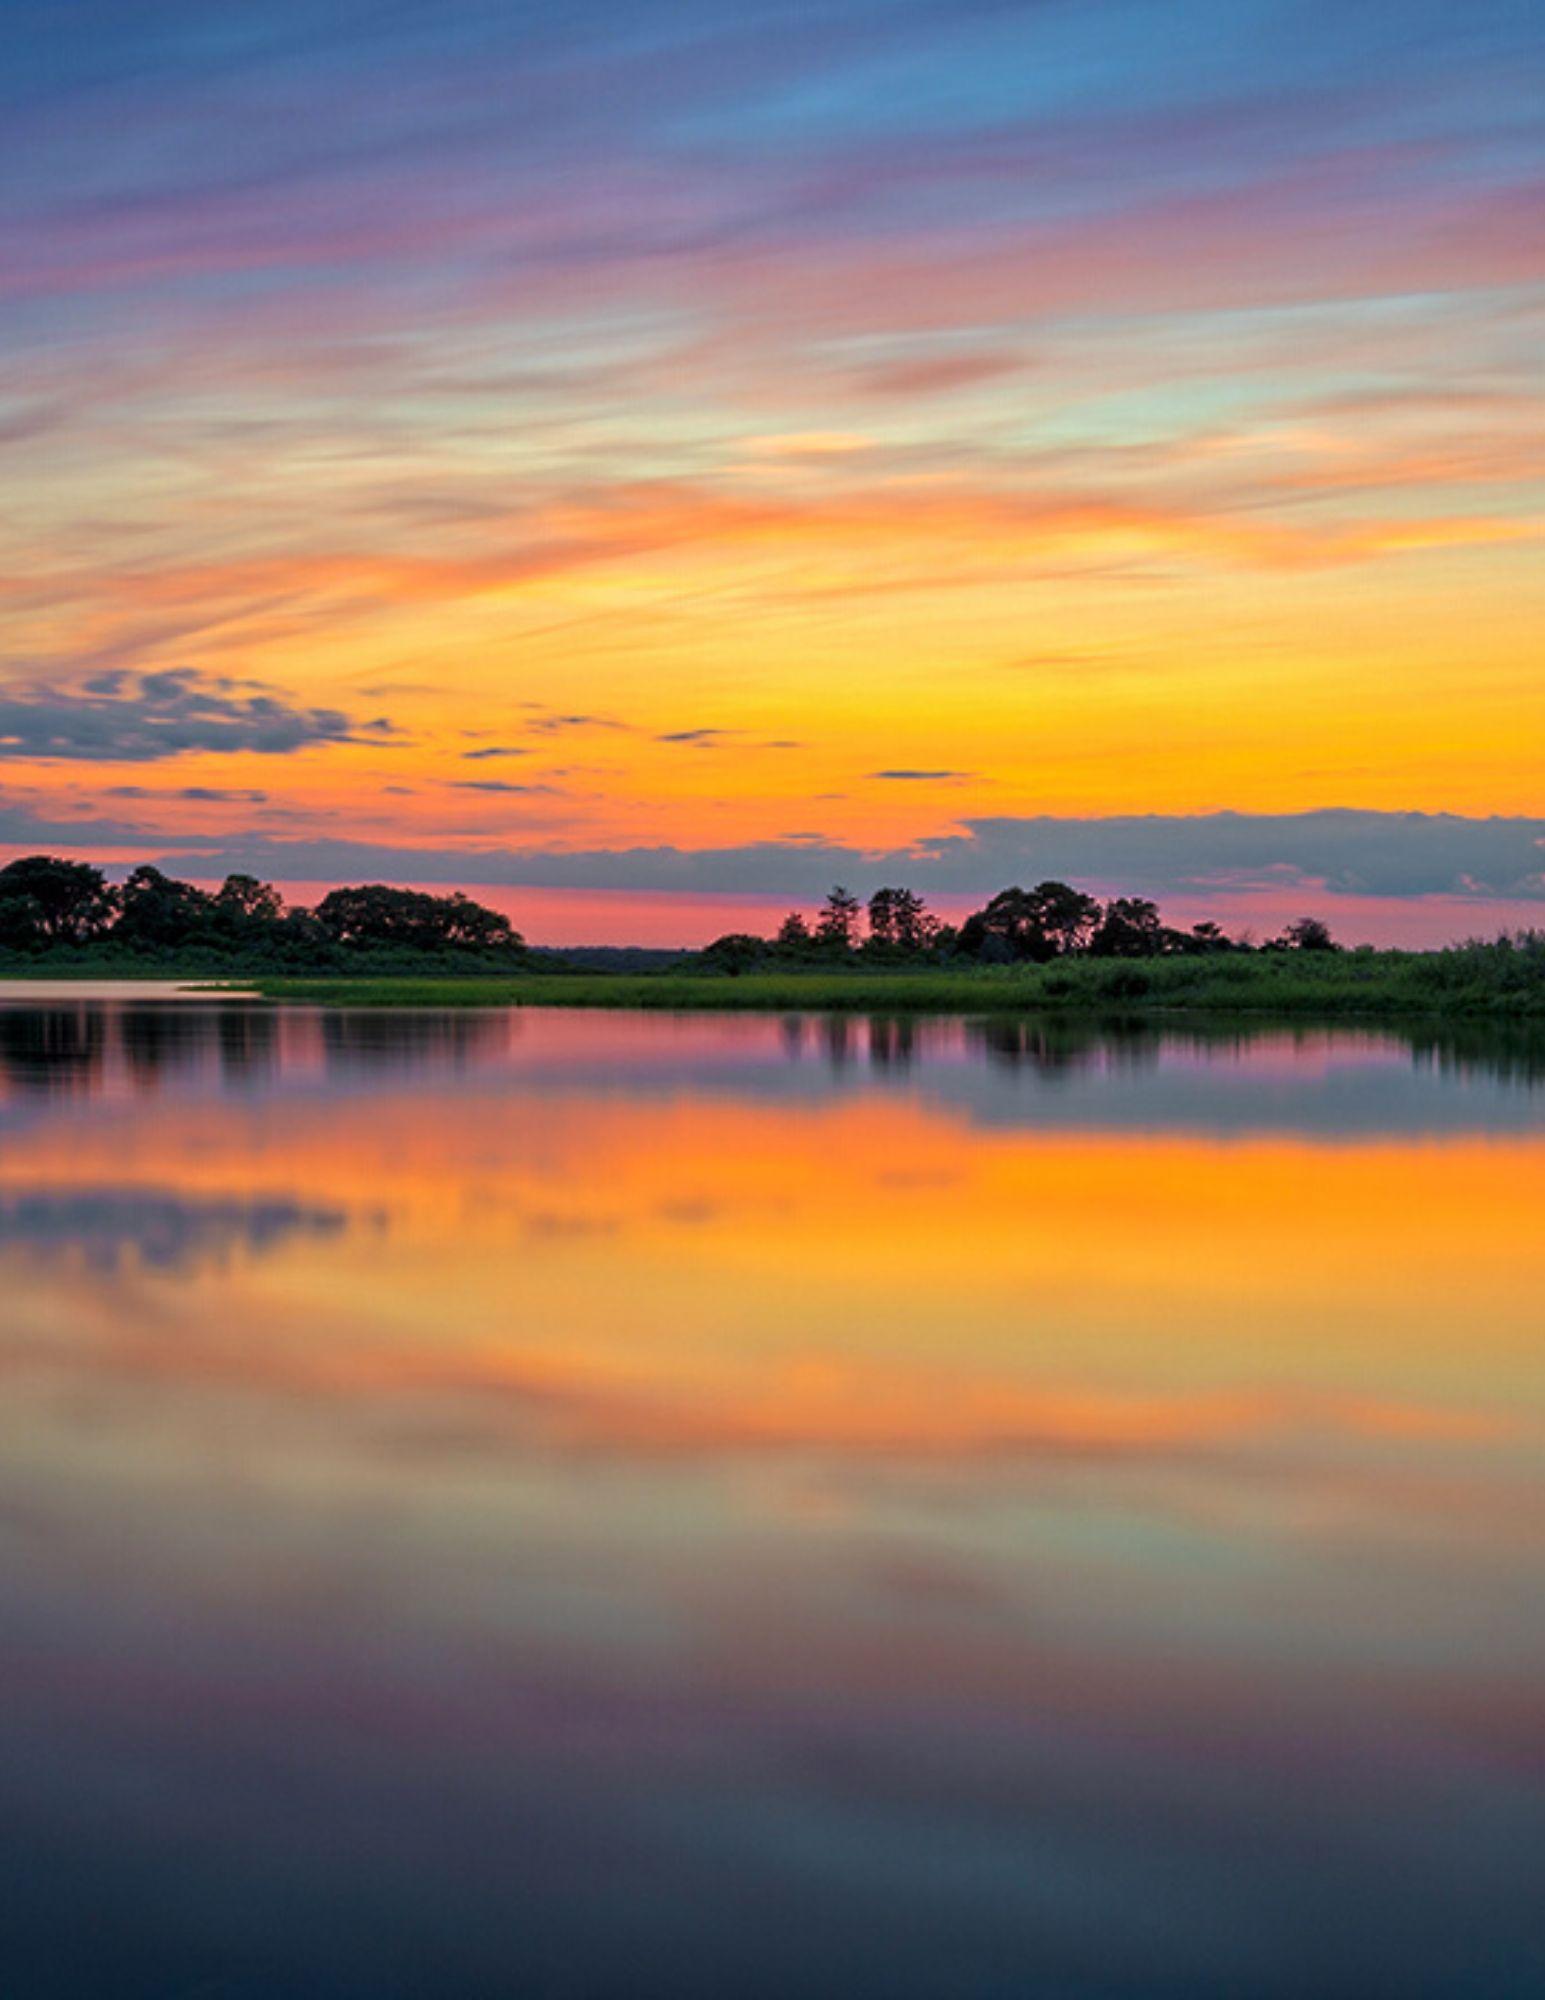 John Montes Jr Photography Best Places to Photograph Sunrise and Sunset on Marthas Vineyard-Best Places to Photograph Sunrise and Sunset on Marthas Vineyard-31